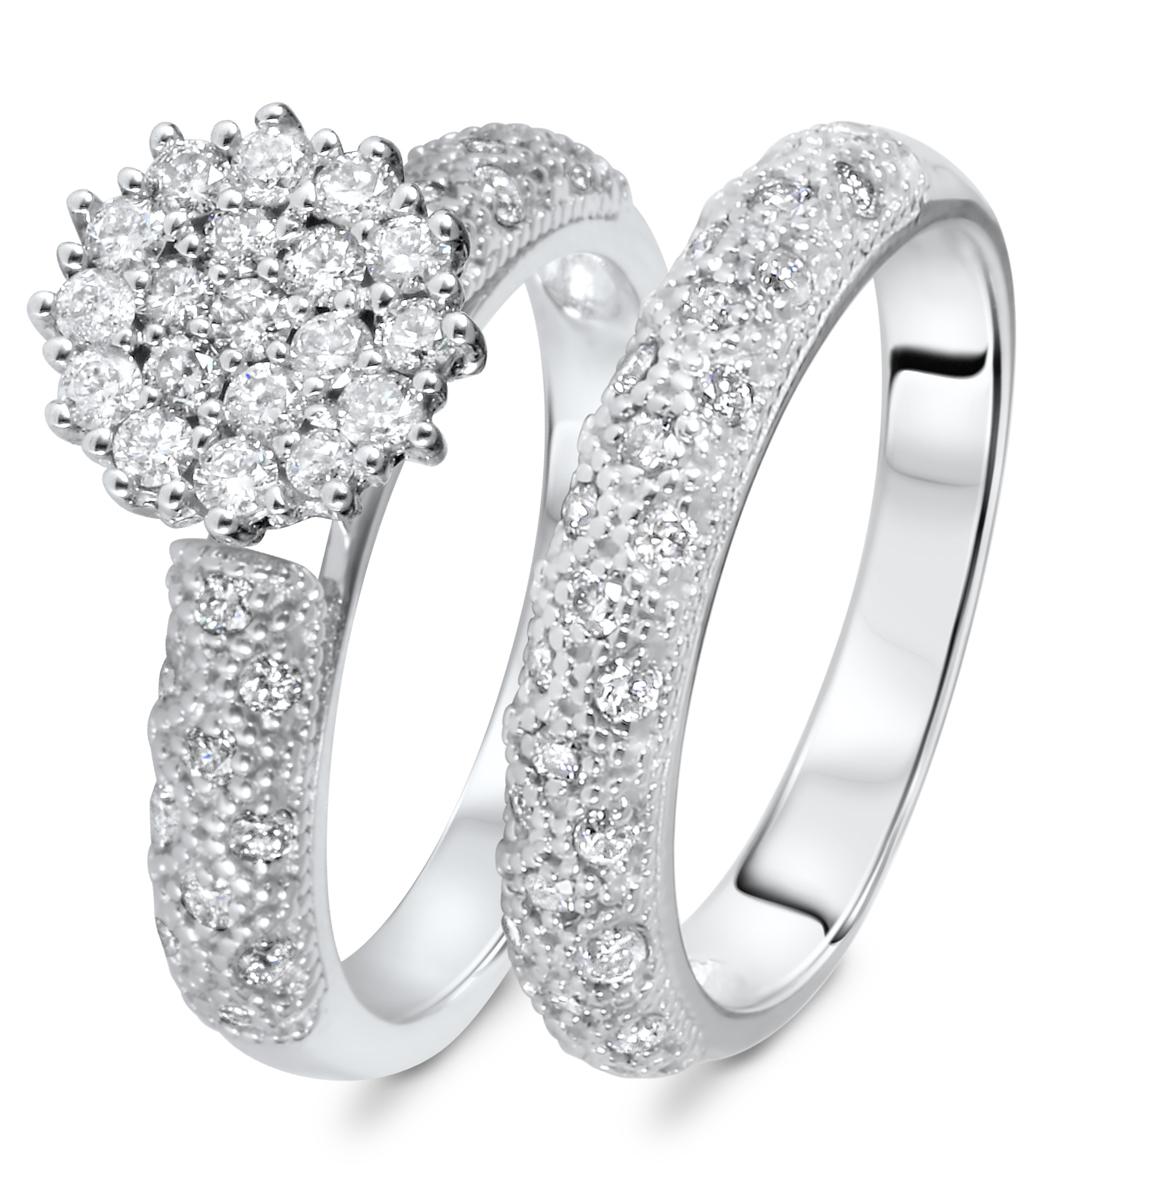 7/8 CT. T.W. Diamond Women's Bridal Wedding Ring Set 10K White Gold